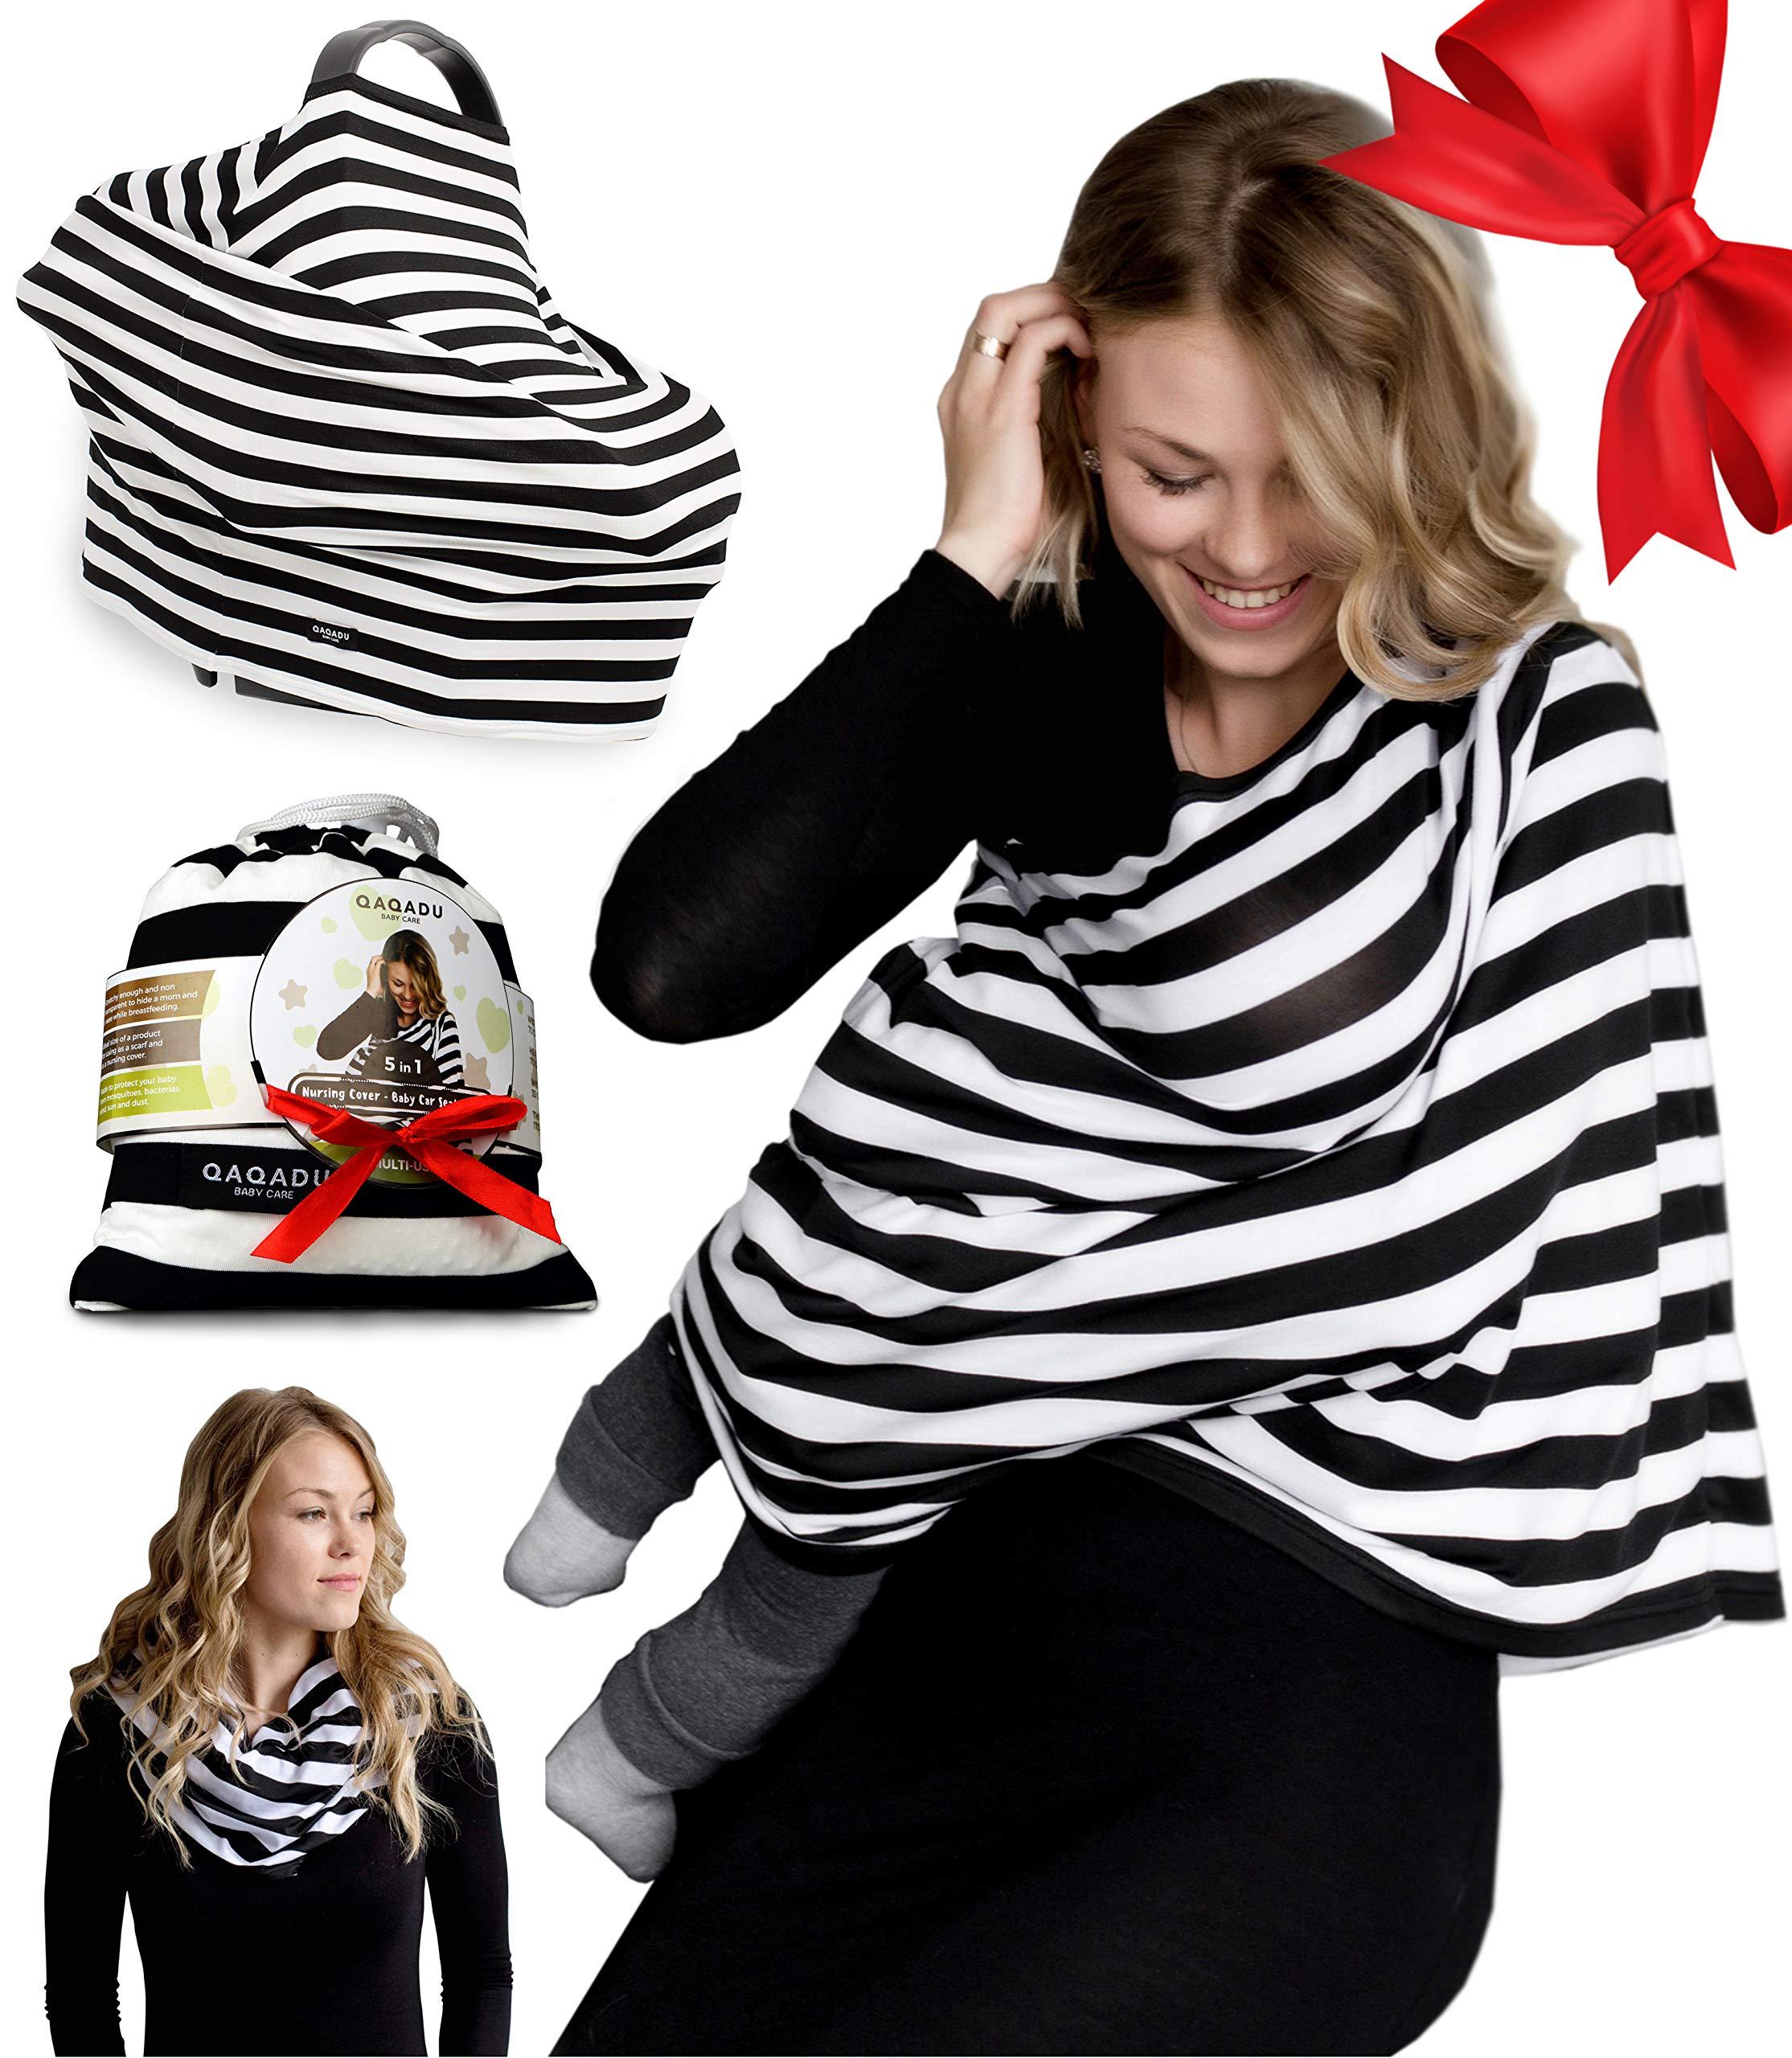 d41a75788fe Amazon.com  Nursing Breastfeeding Cover Scarf - Baby Car Seat Canopy -  Nursing Pads